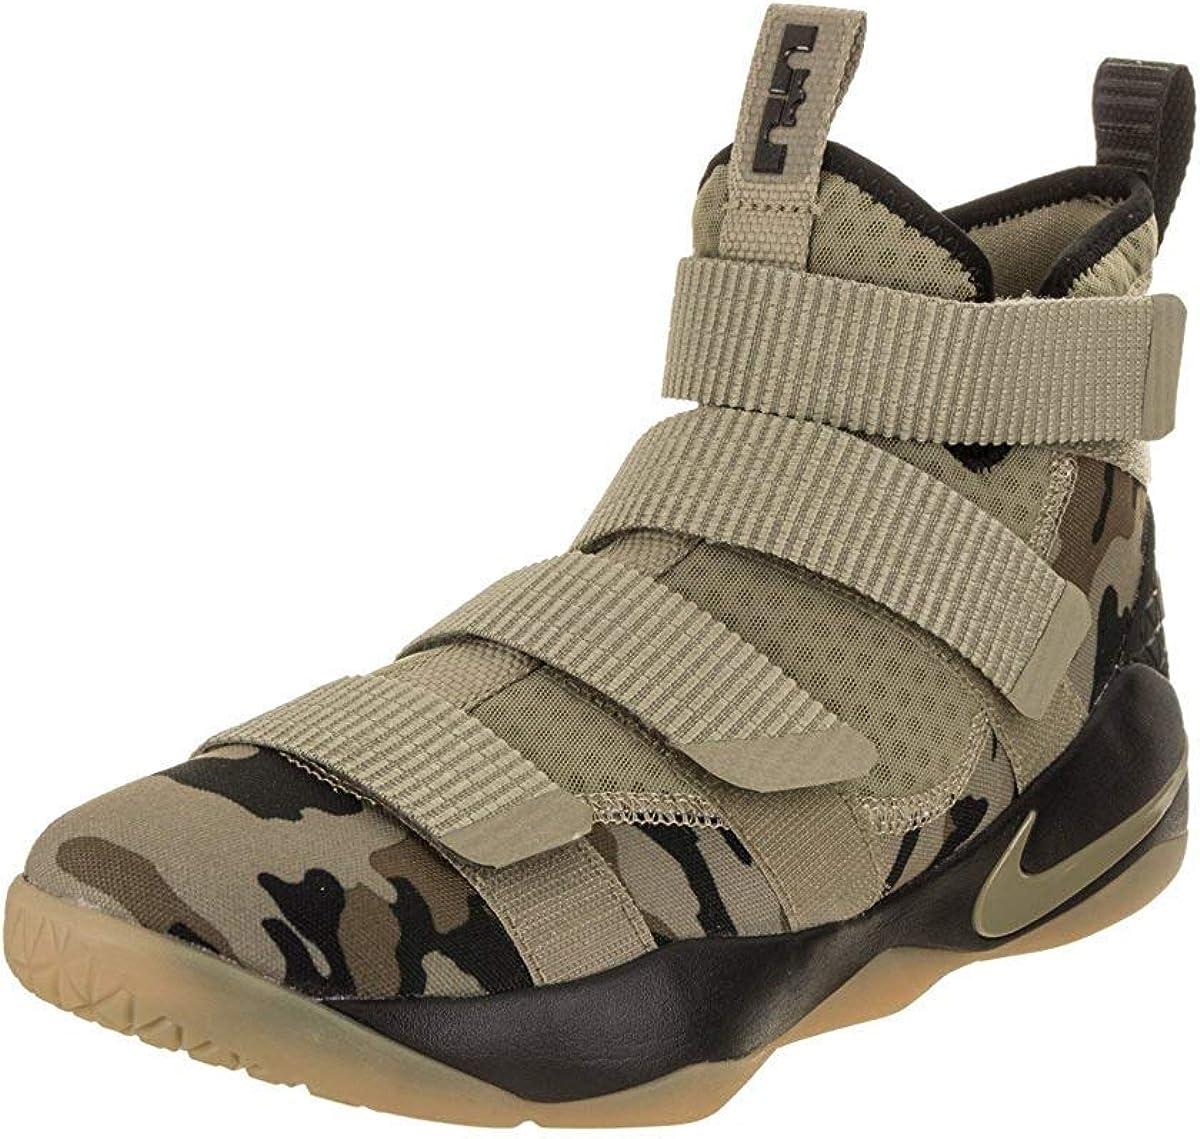 Nike LeBron Soldier 11 Amazon.com | Nike Lebron Soldier XI Mens Basketball Shoes | Basketball